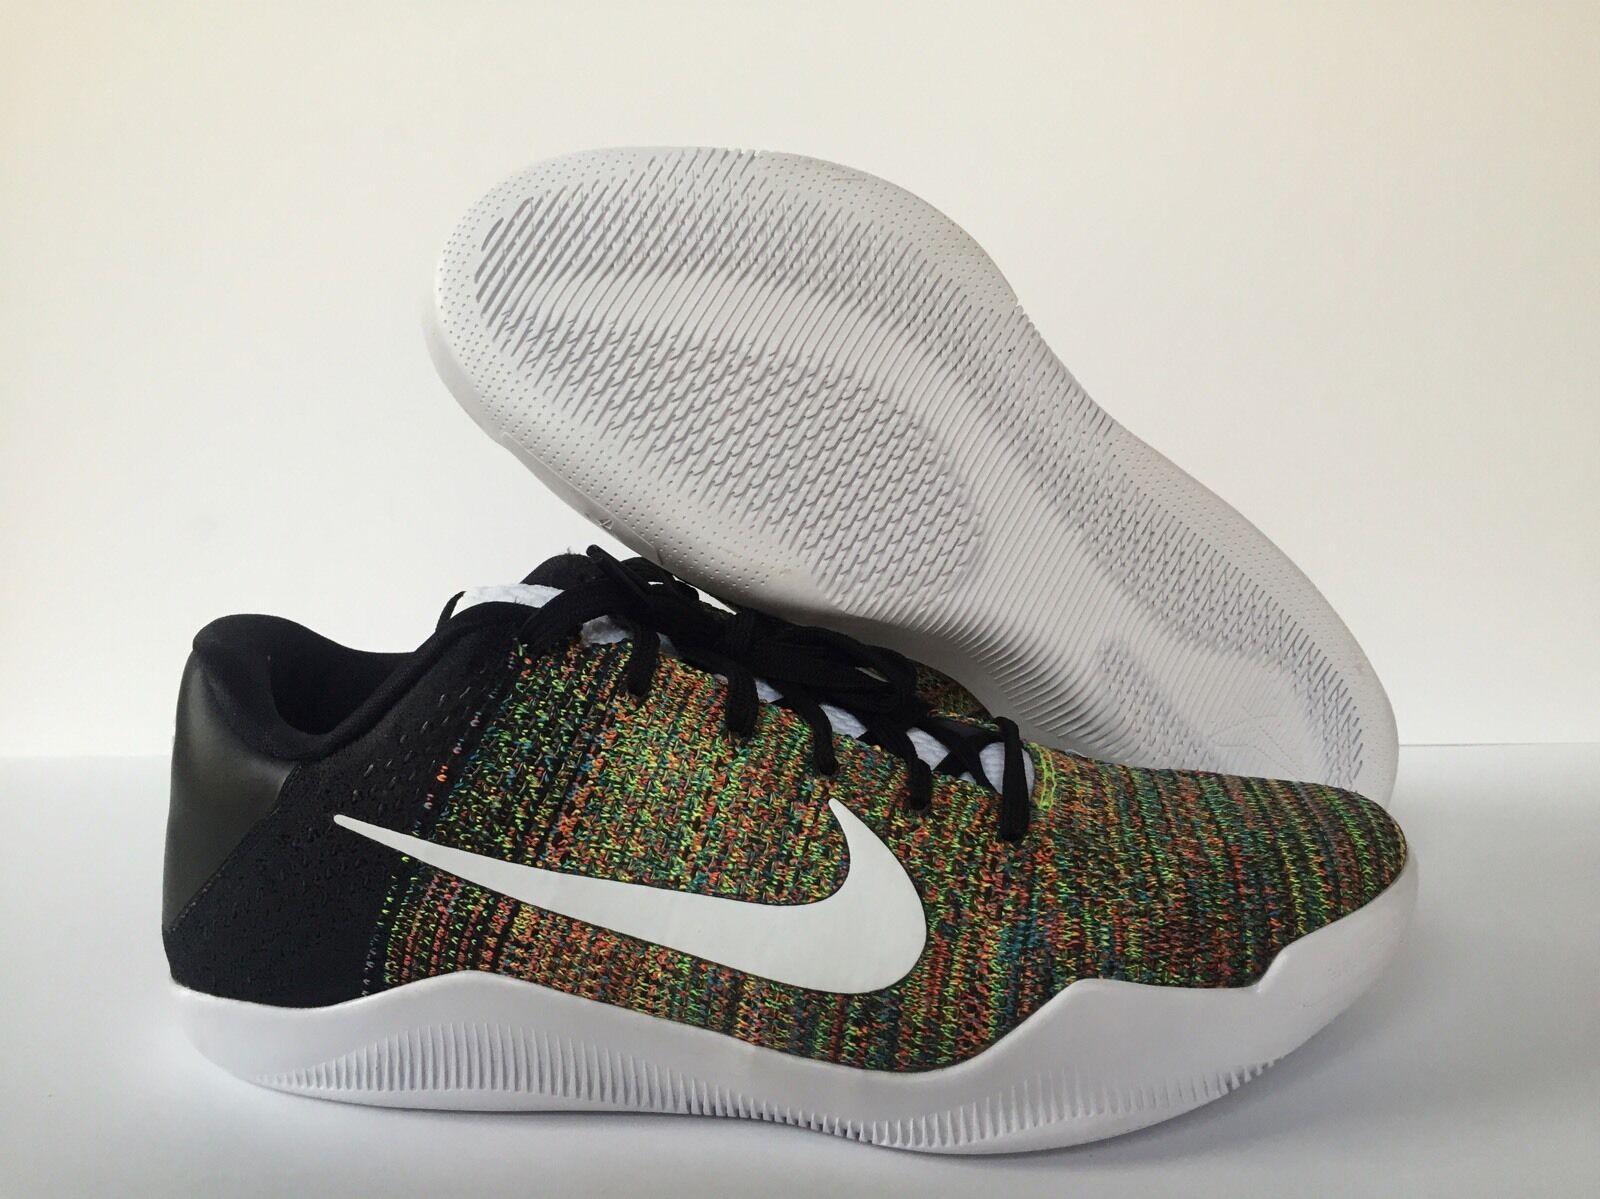 Nike Kobe XI XI XI Elite bajo Flyknit iD Multicolor 2018 Hombre [903712-993] cc1607